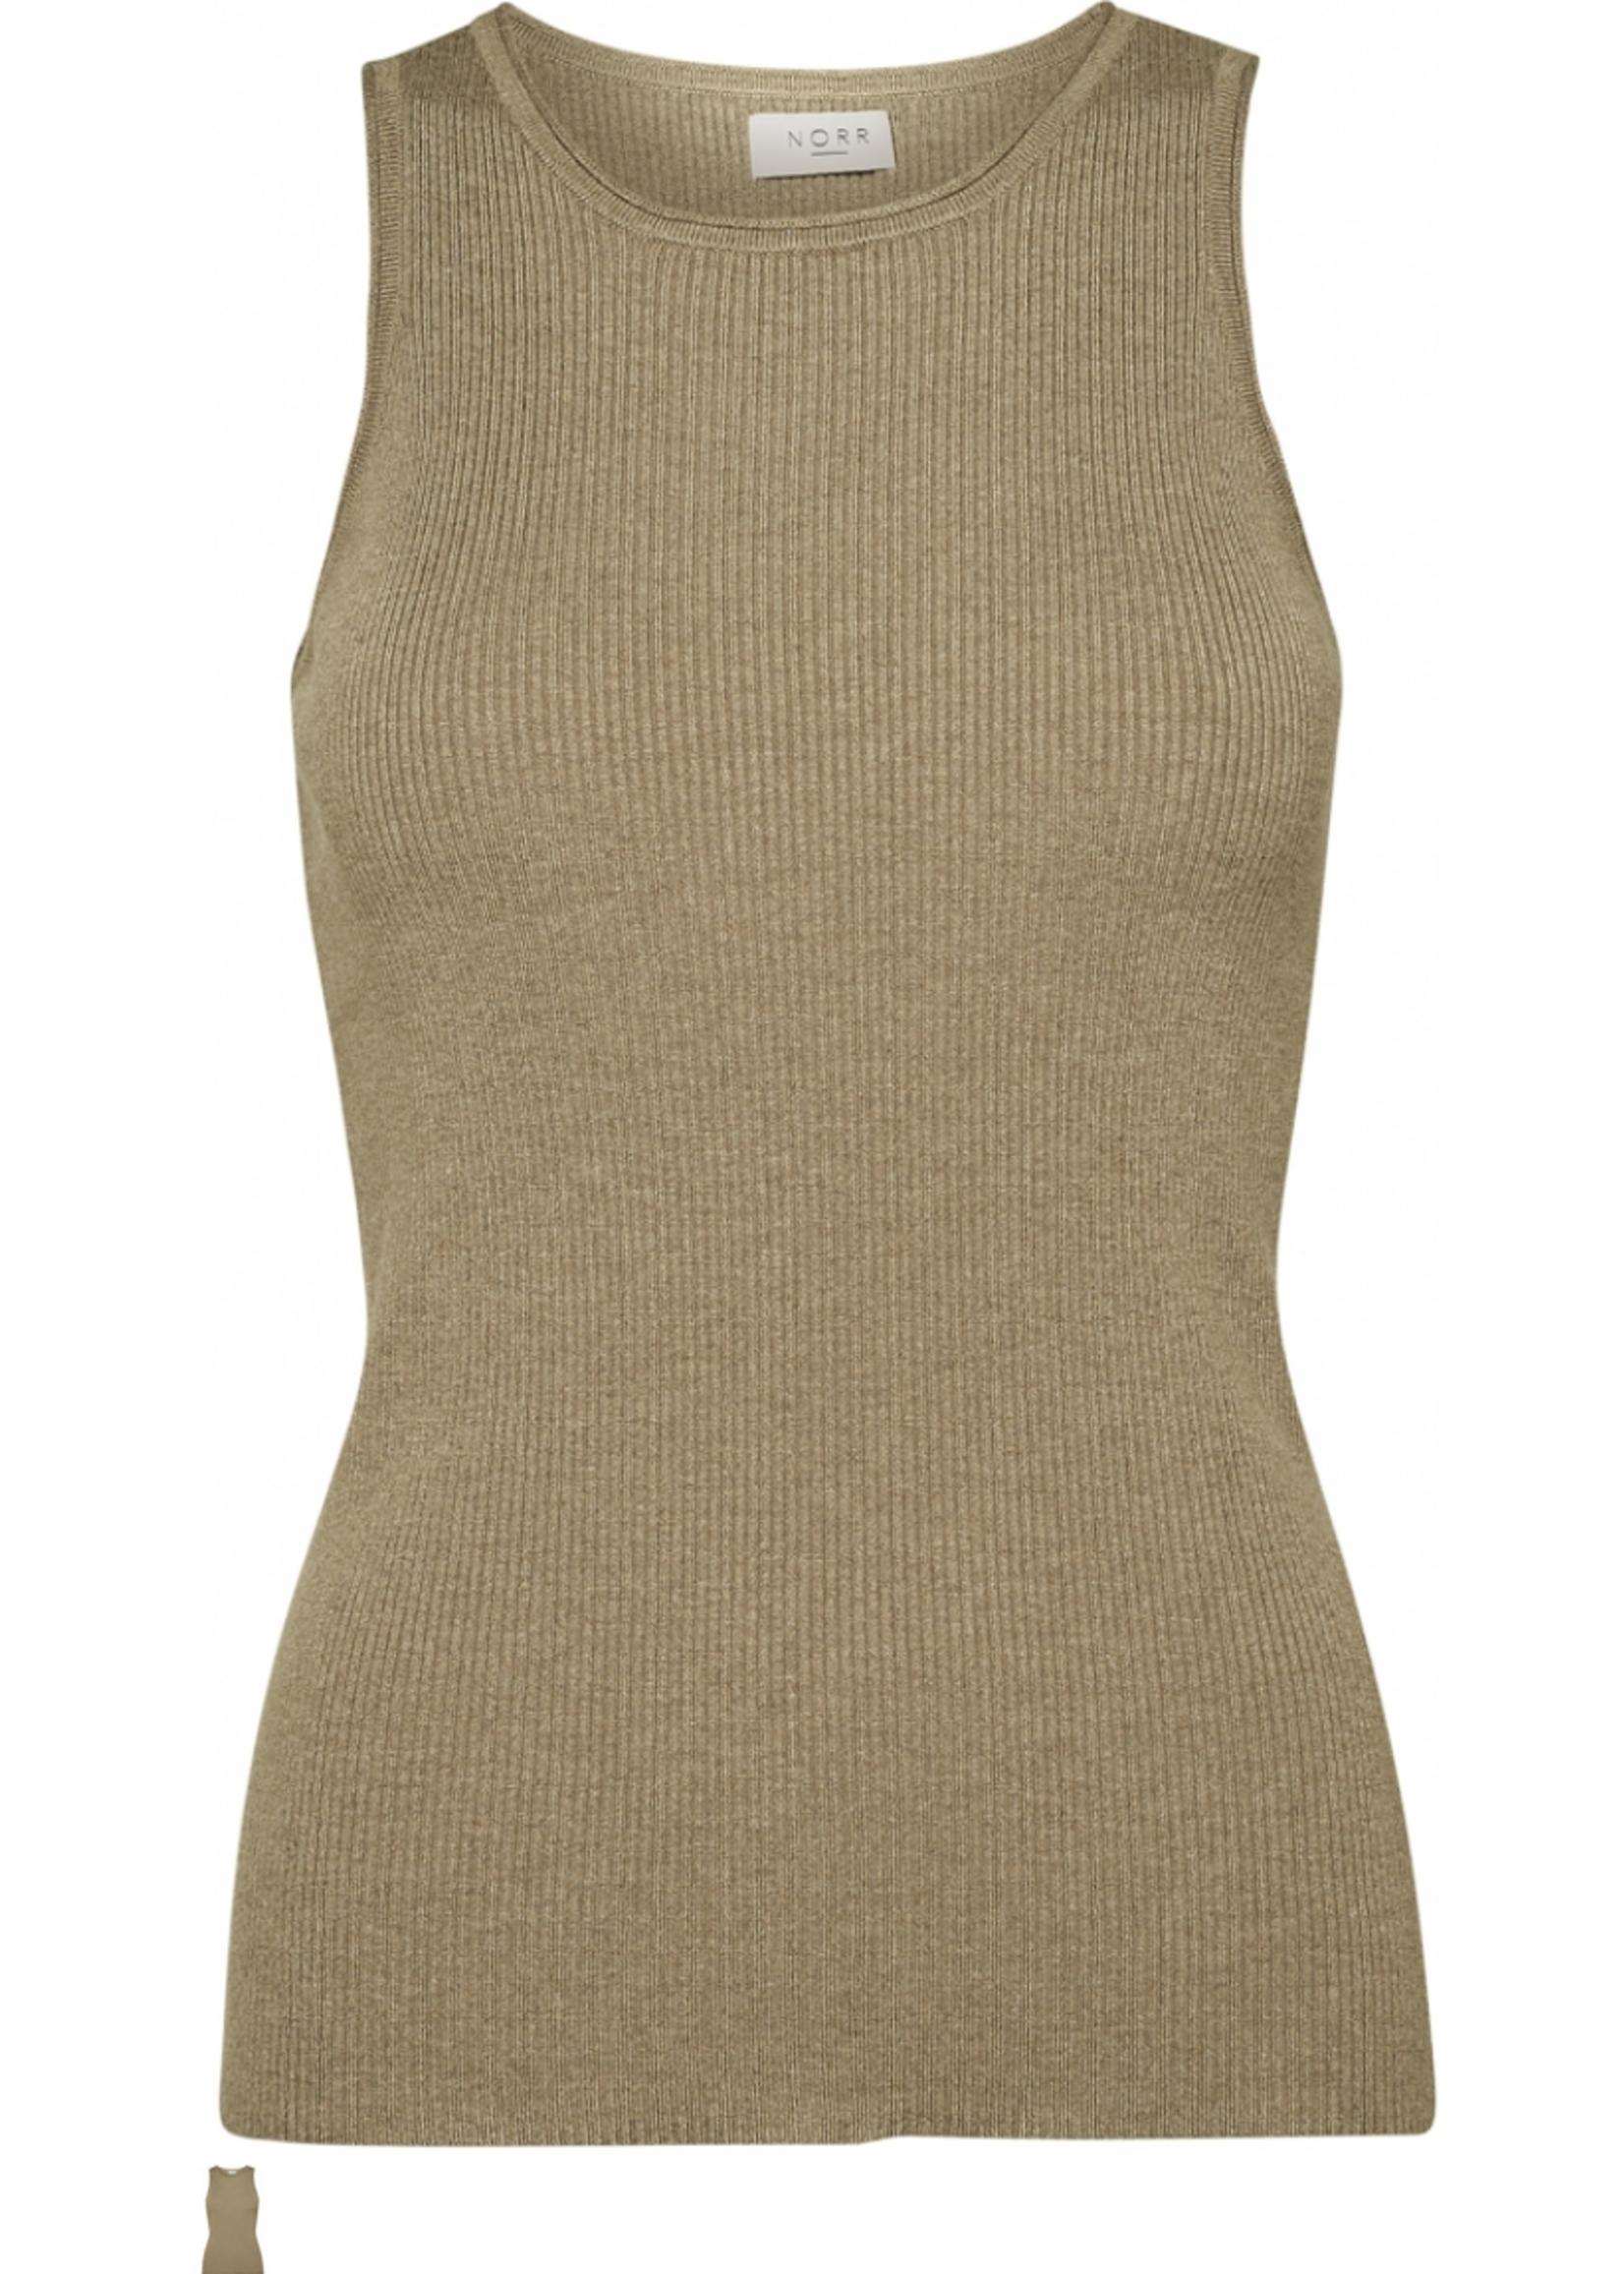 Norr Flora knit top